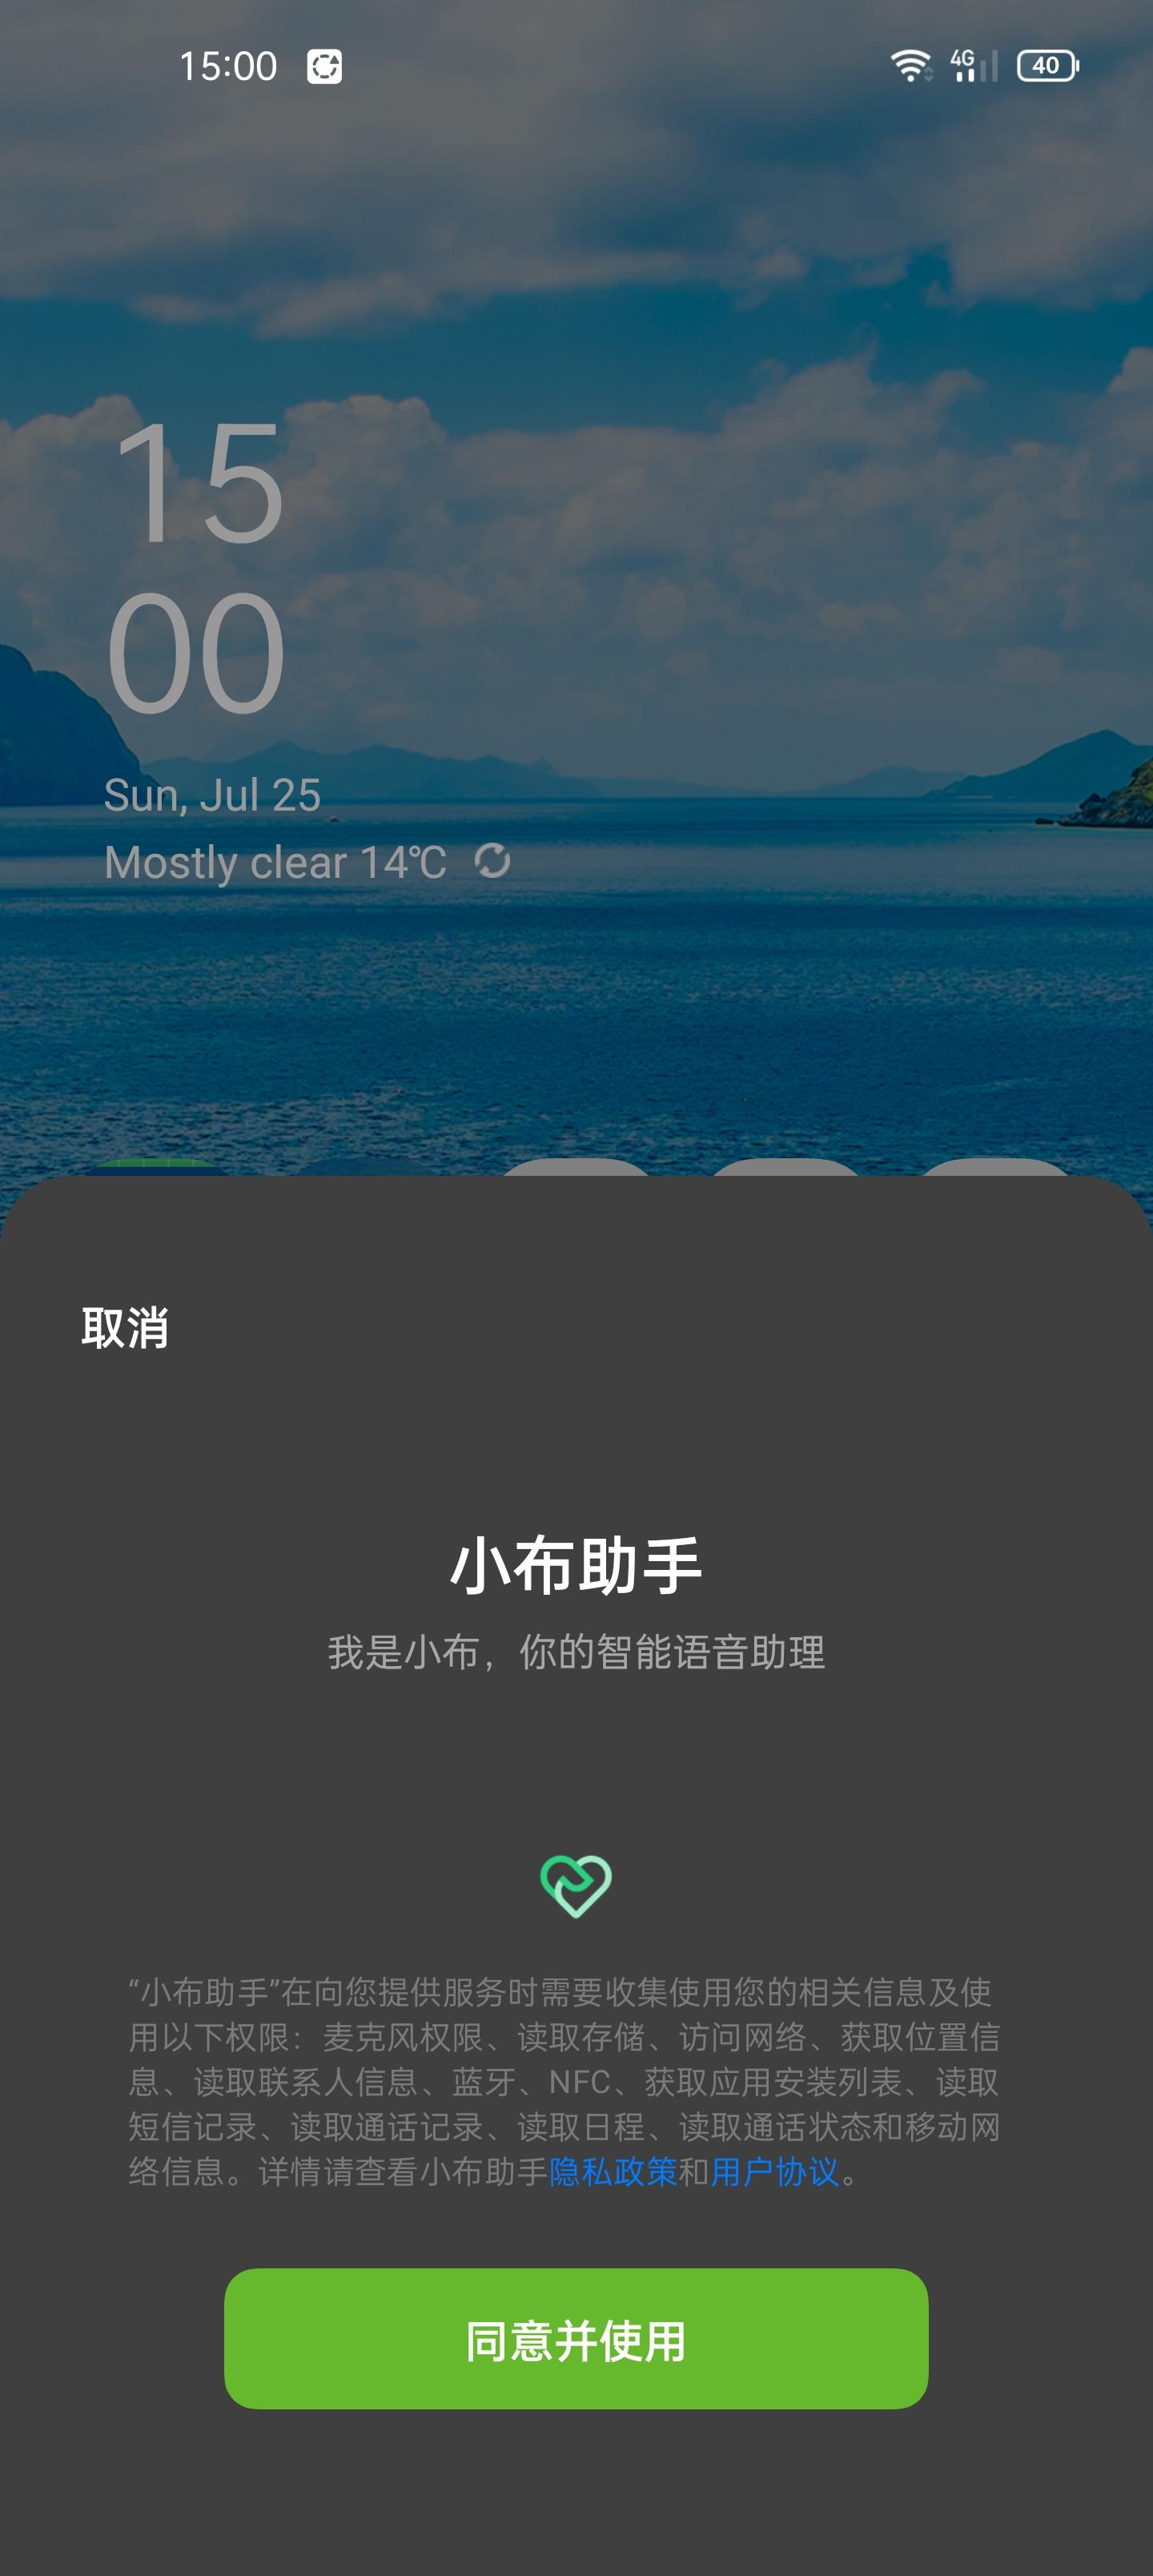 Screenshot_2021-07-25-15-00-15-81_24b1f35b7ecf5335675b84677f729637.jpg